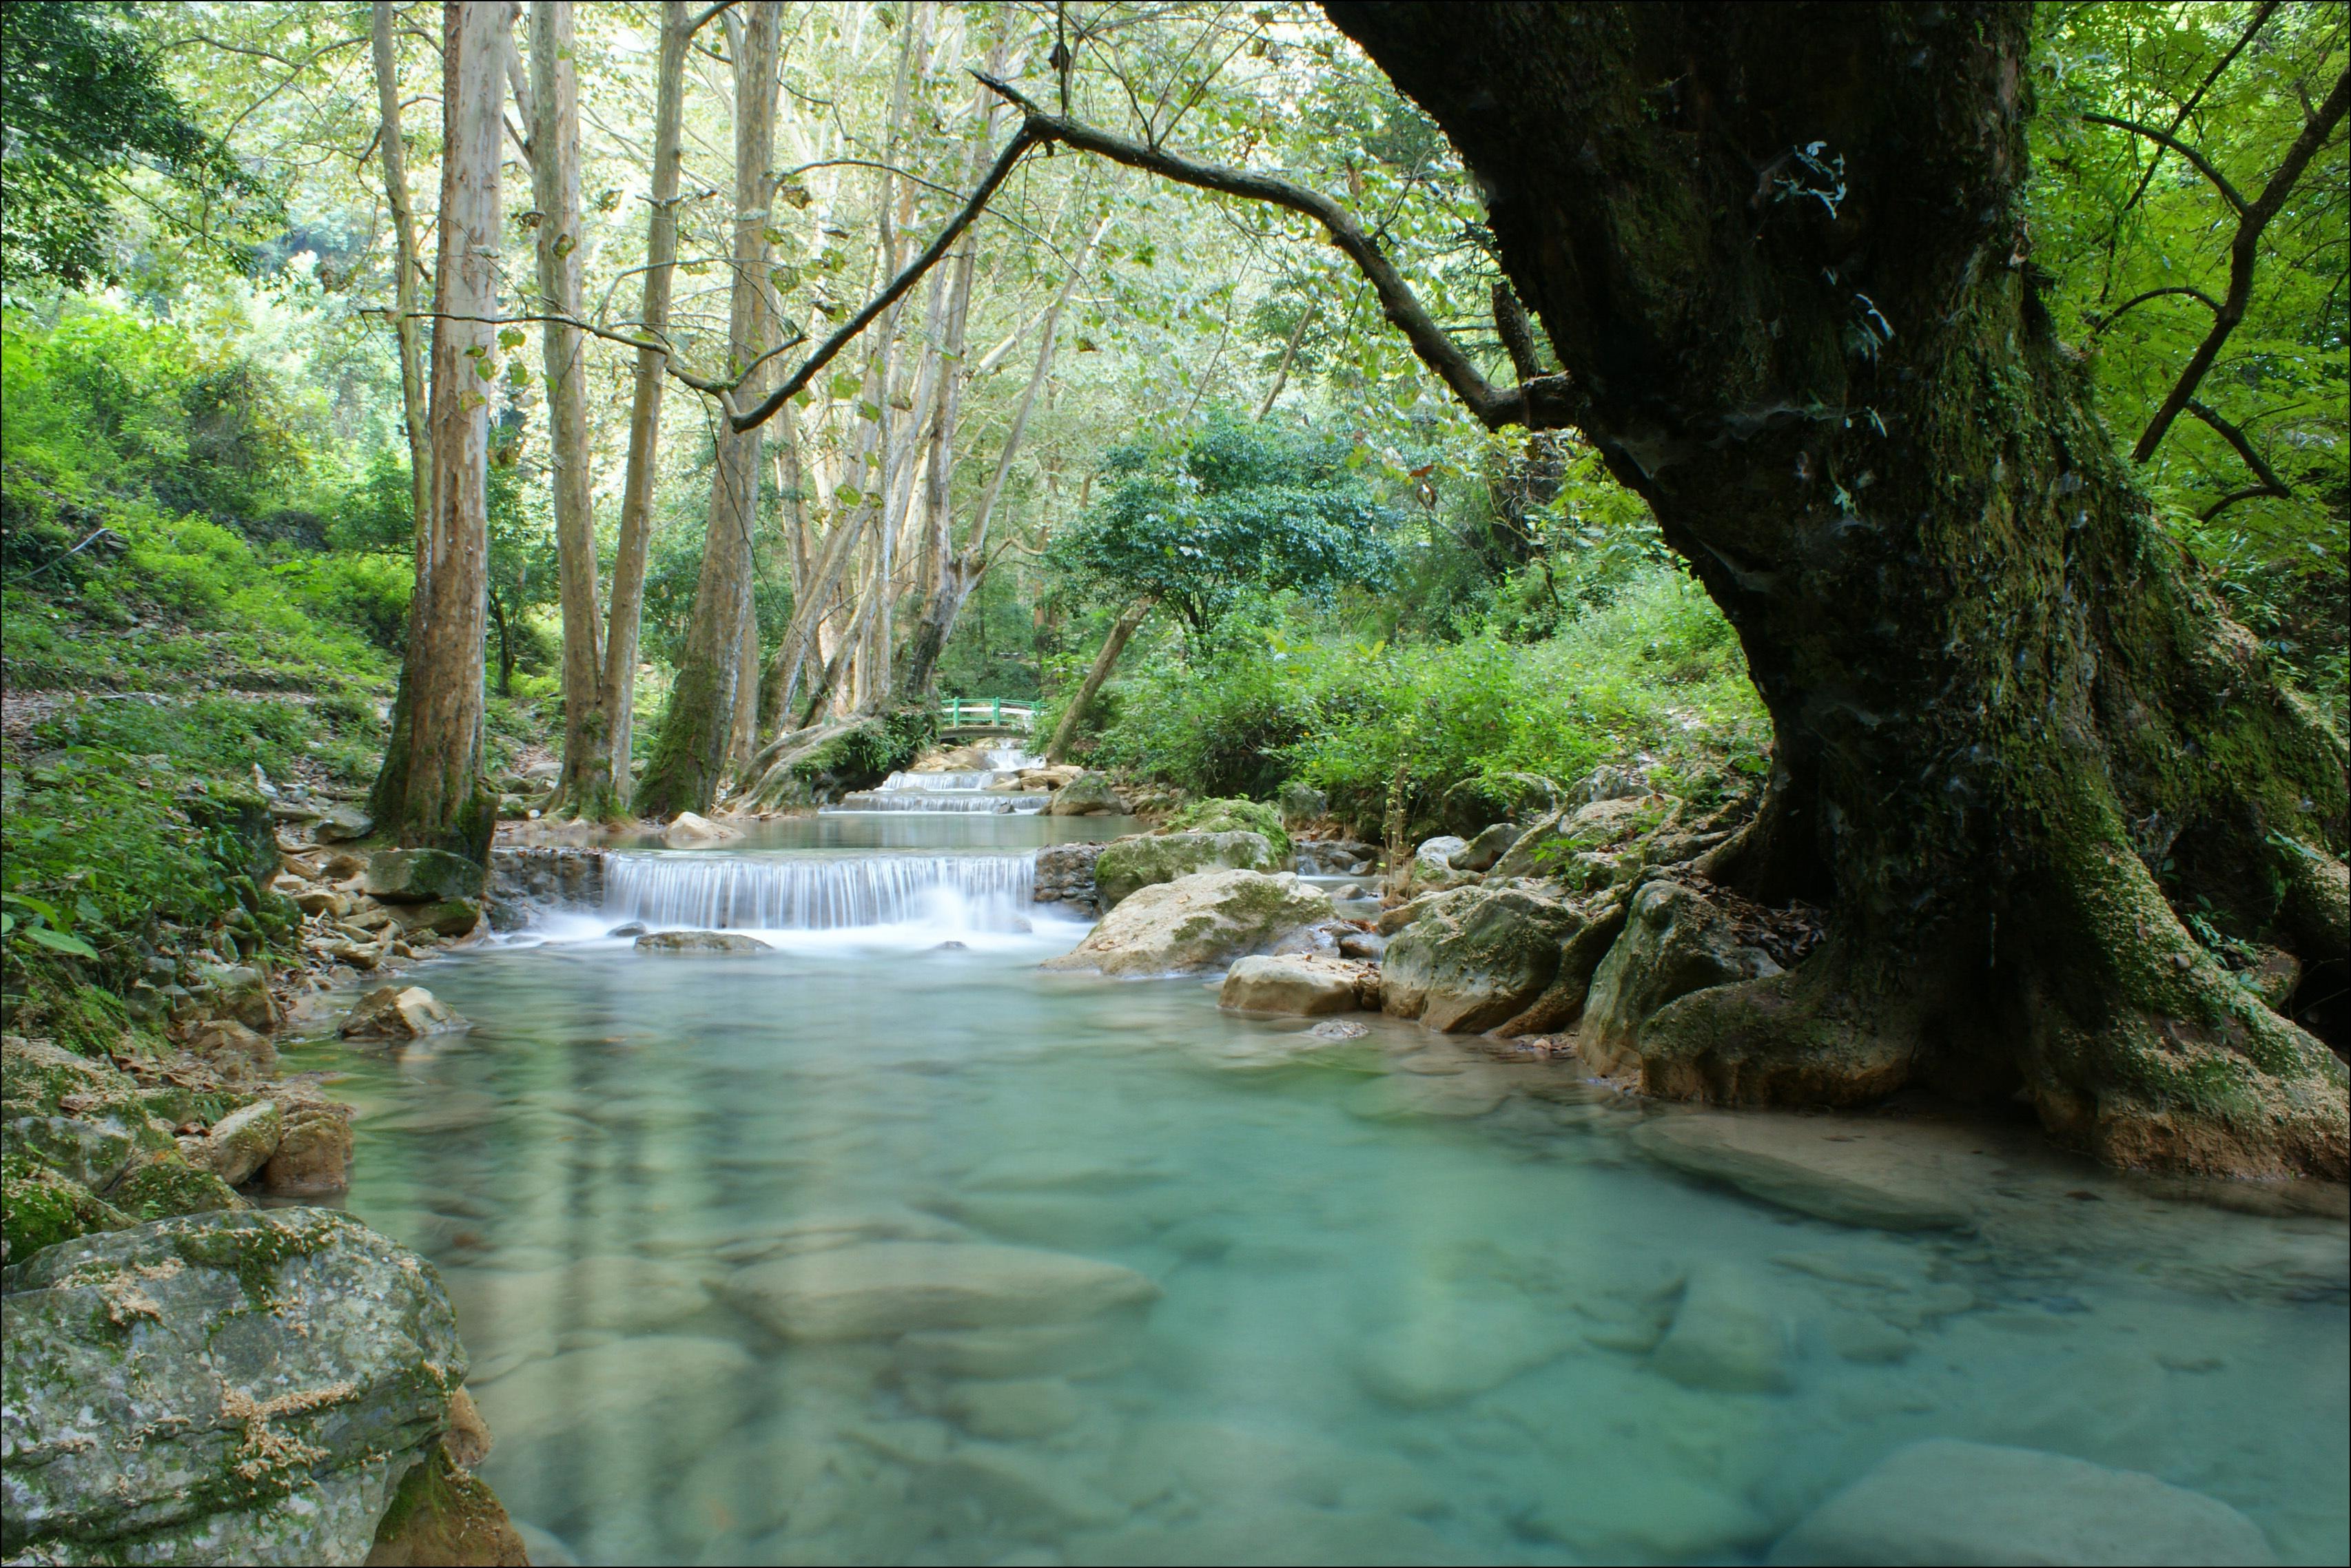 природа река водопад лес деревья nature river waterfall forest trees  № 484084 загрузить